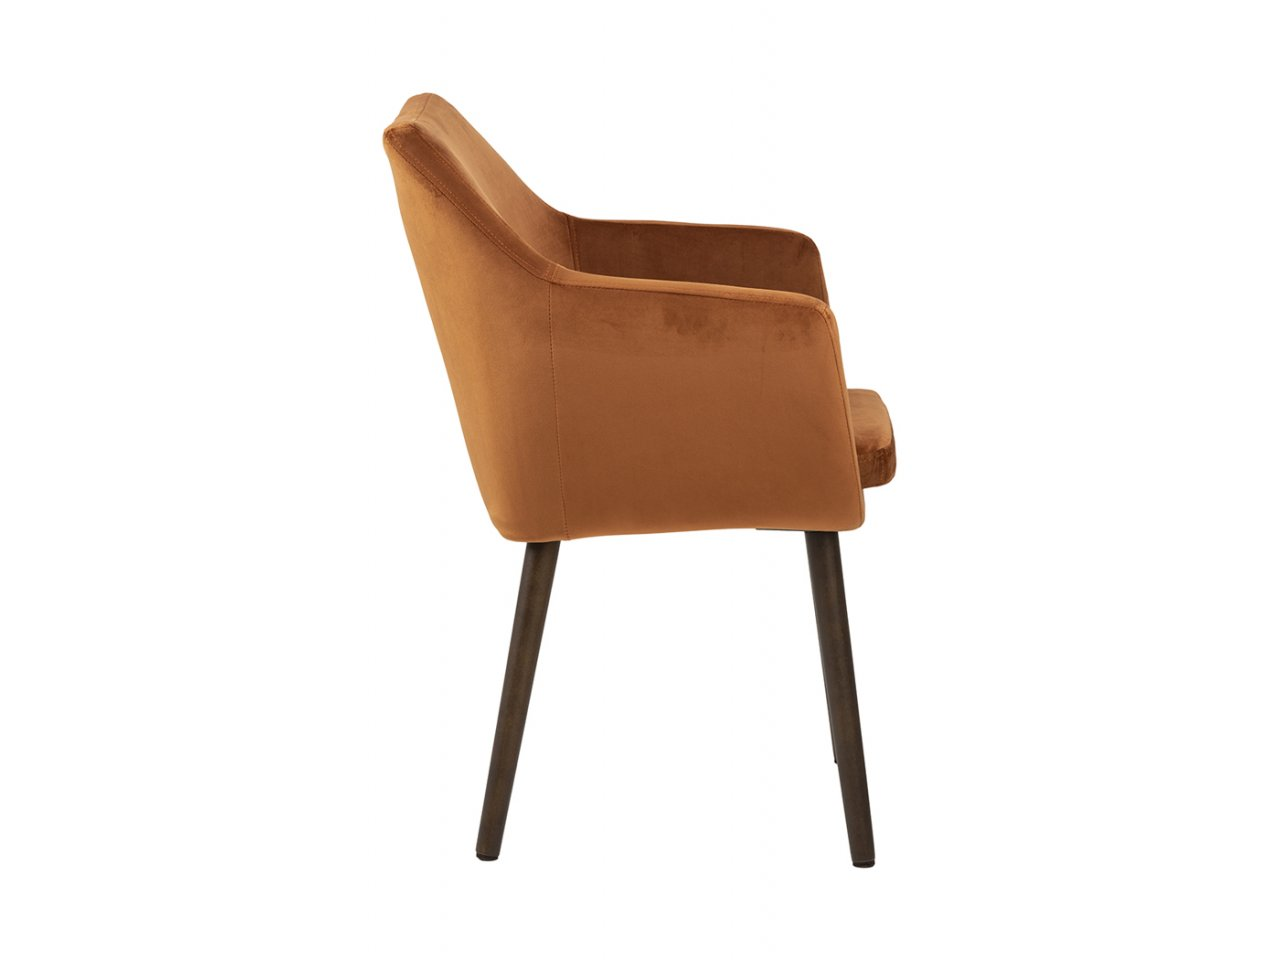 Sedia con braccioli Finalborgo - v13